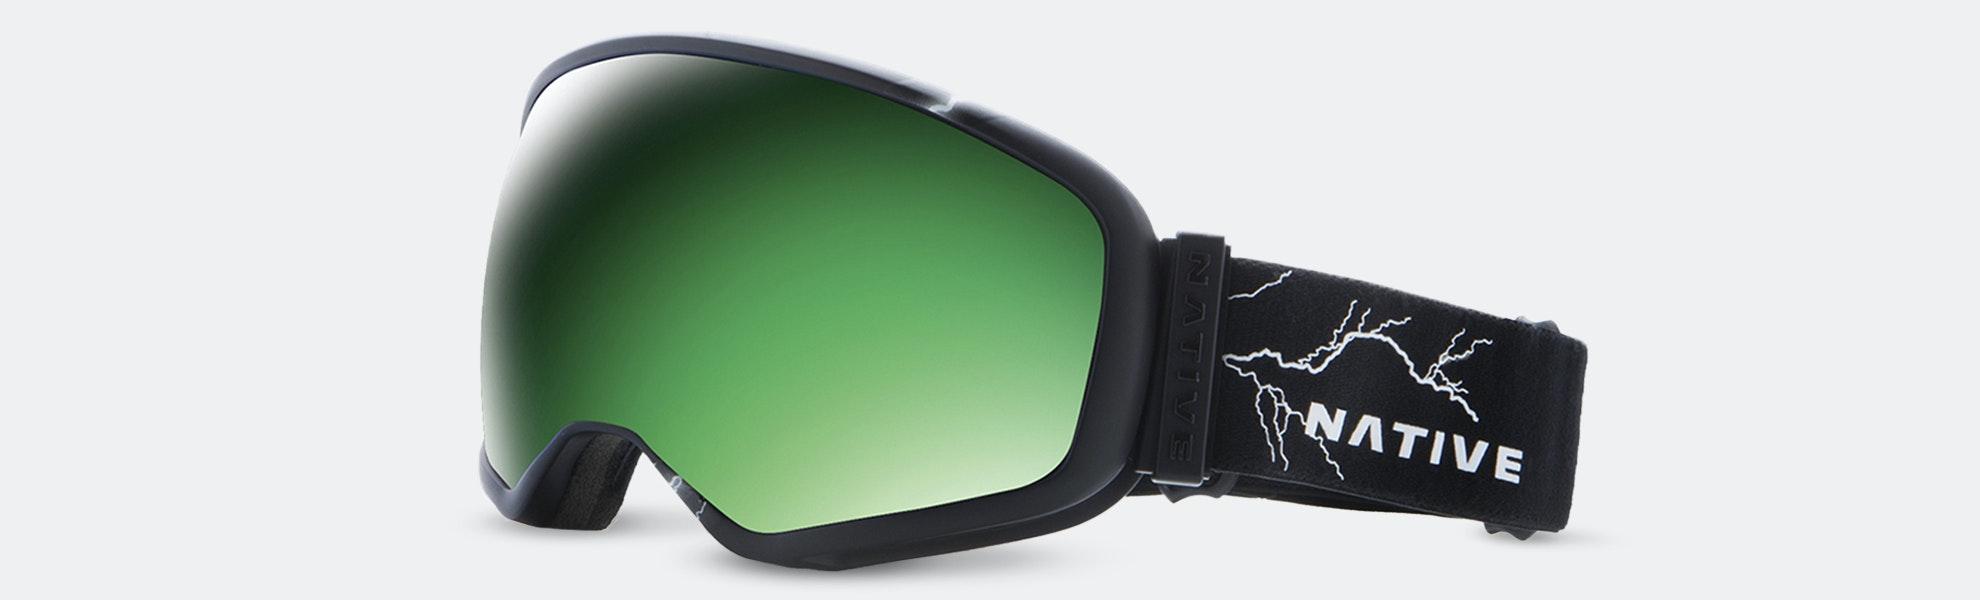 Native Eyewear Tank 7 Snow Goggles